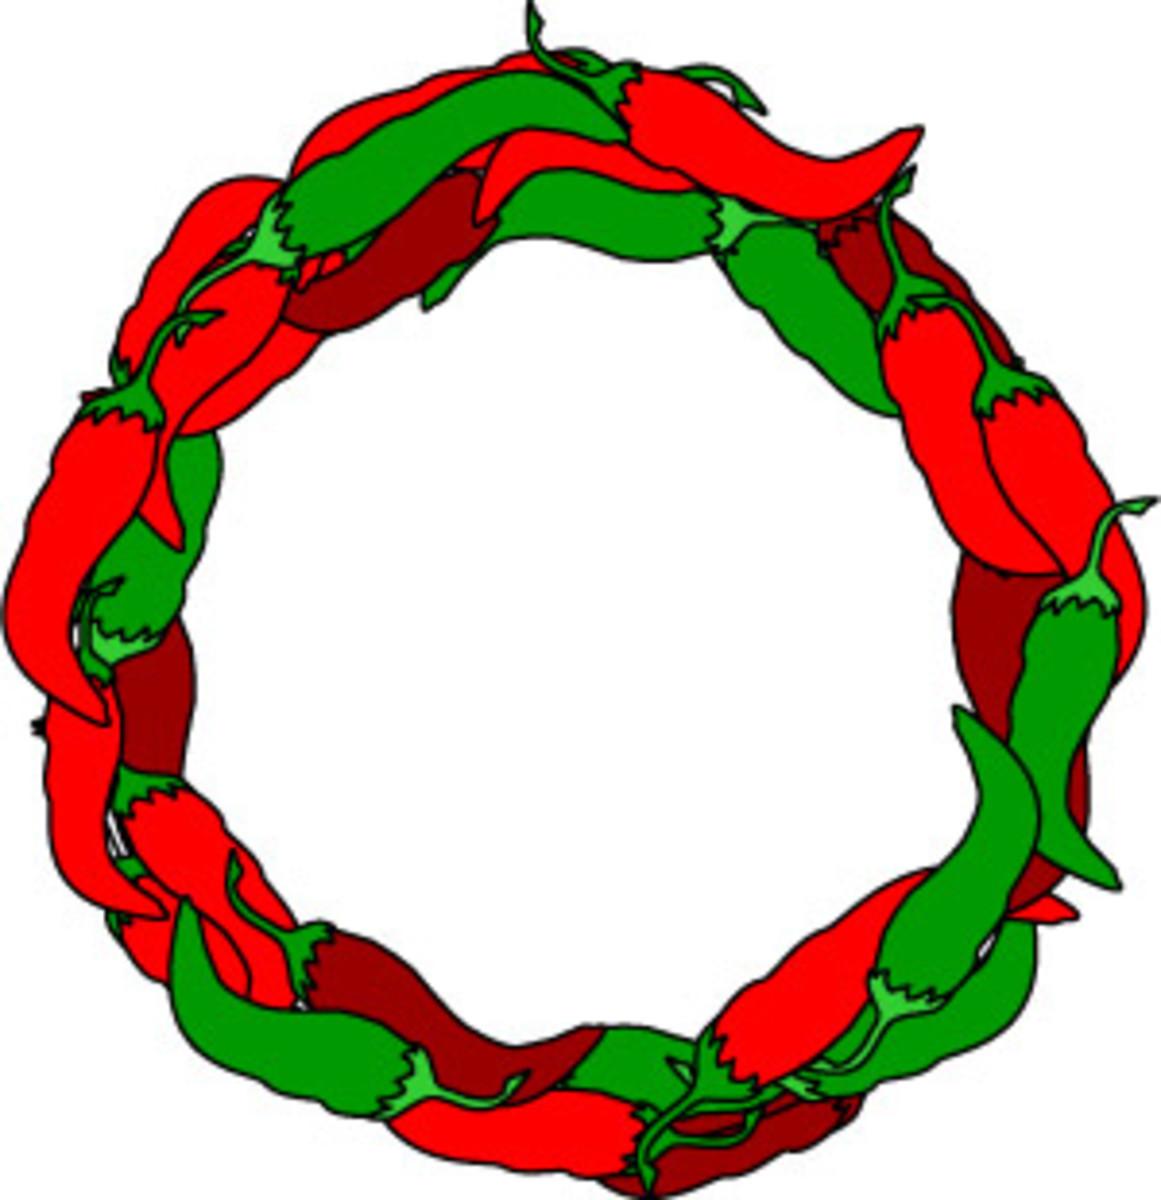 Chili peppers wreath border clip art